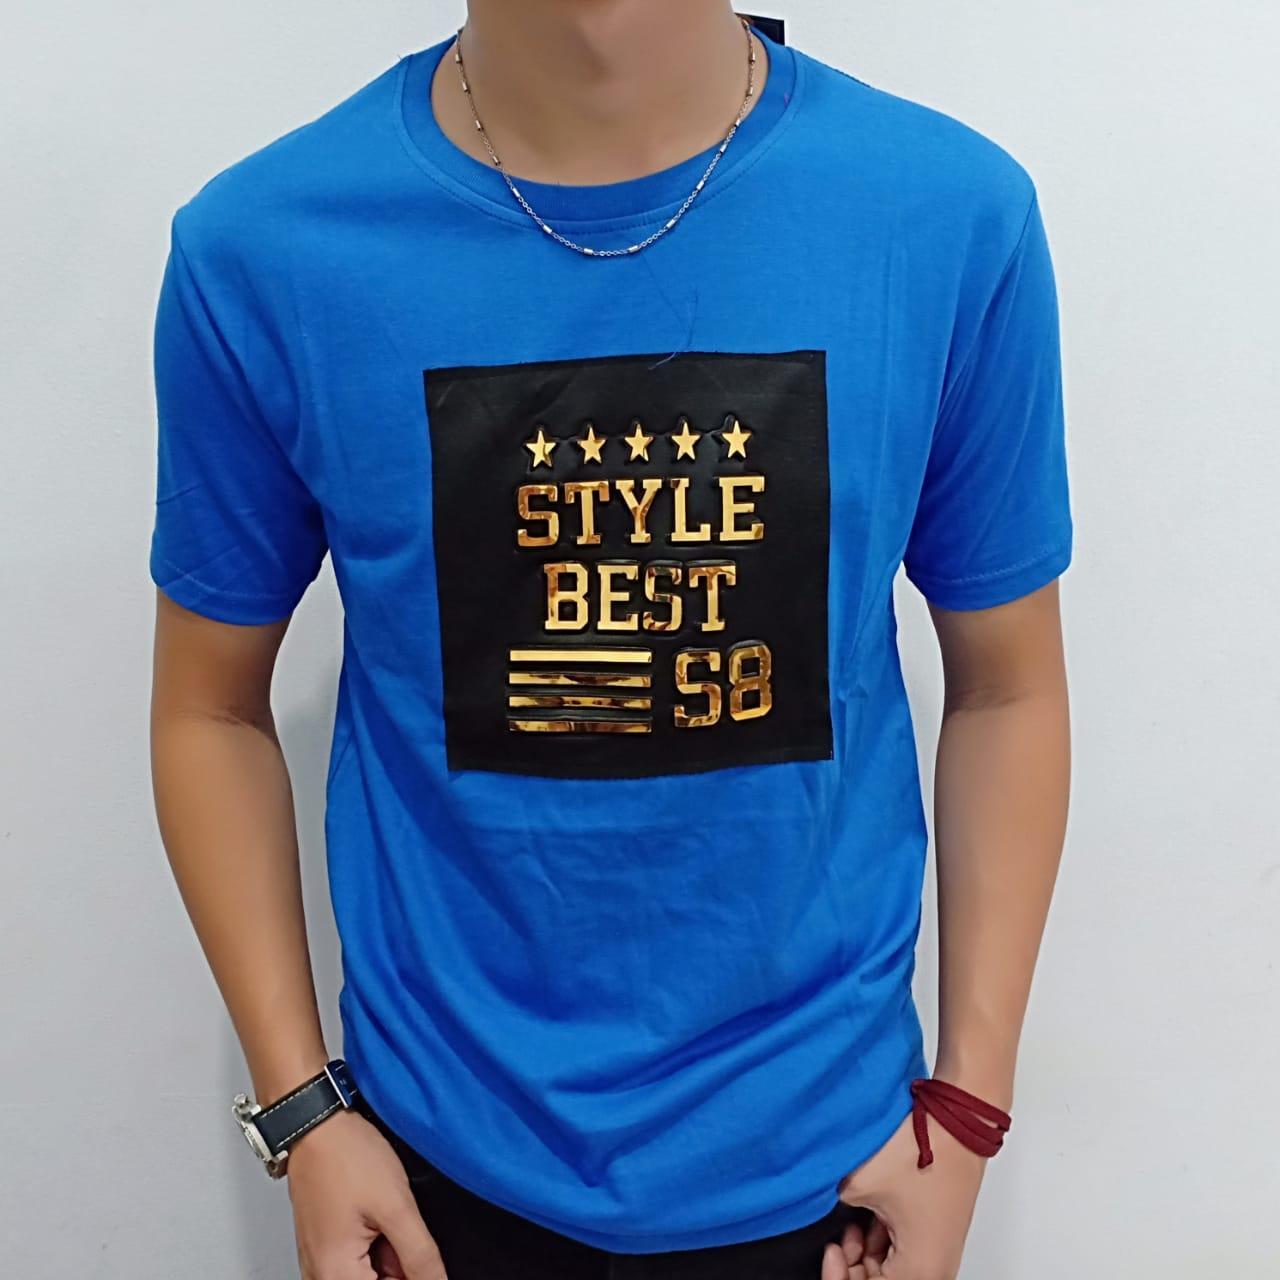 Buy Sell Cheapest Baru Fashion Soft Best Quality Product Deals Tshirt Distro Catton Combed 30s Moba Master Tee Kaos T Shirt 100 Cotton Pria Wanita Cewe Cowo Baju 3d Terbaru Kekinian Animasi Gambar Style Gold